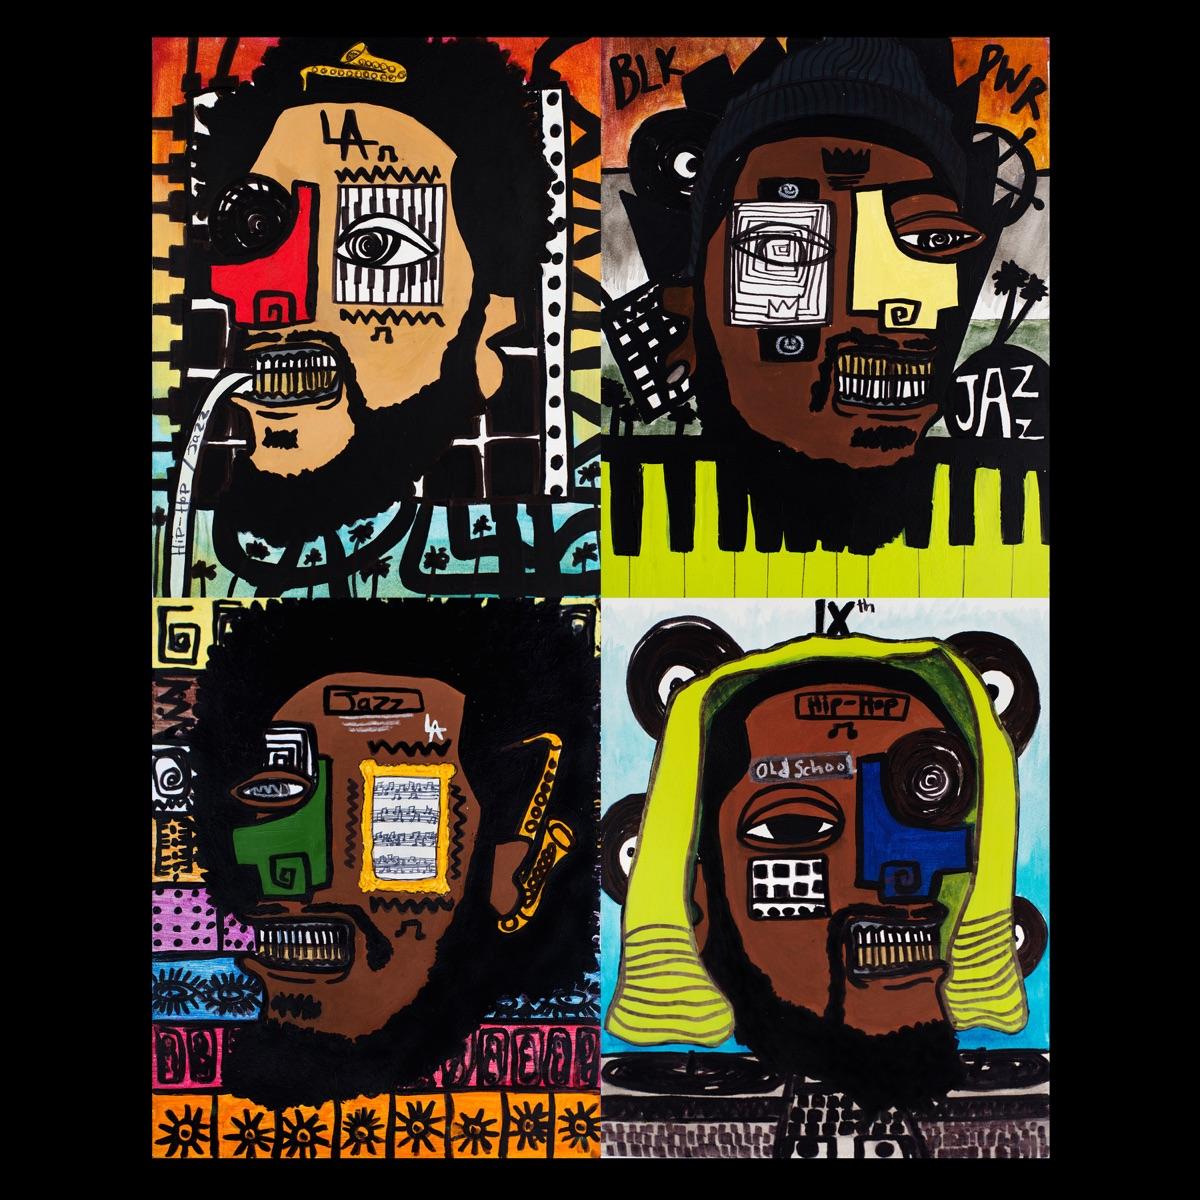 Terrace Martin, Robert Glasper, 9th Wonder & Kamasi Washington — «Dinner Party»